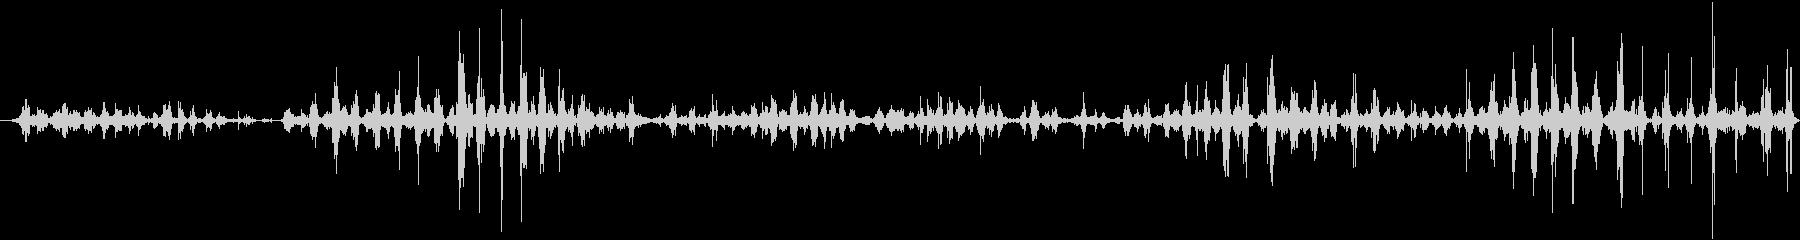 ASMR りんごをする音の未再生の波形